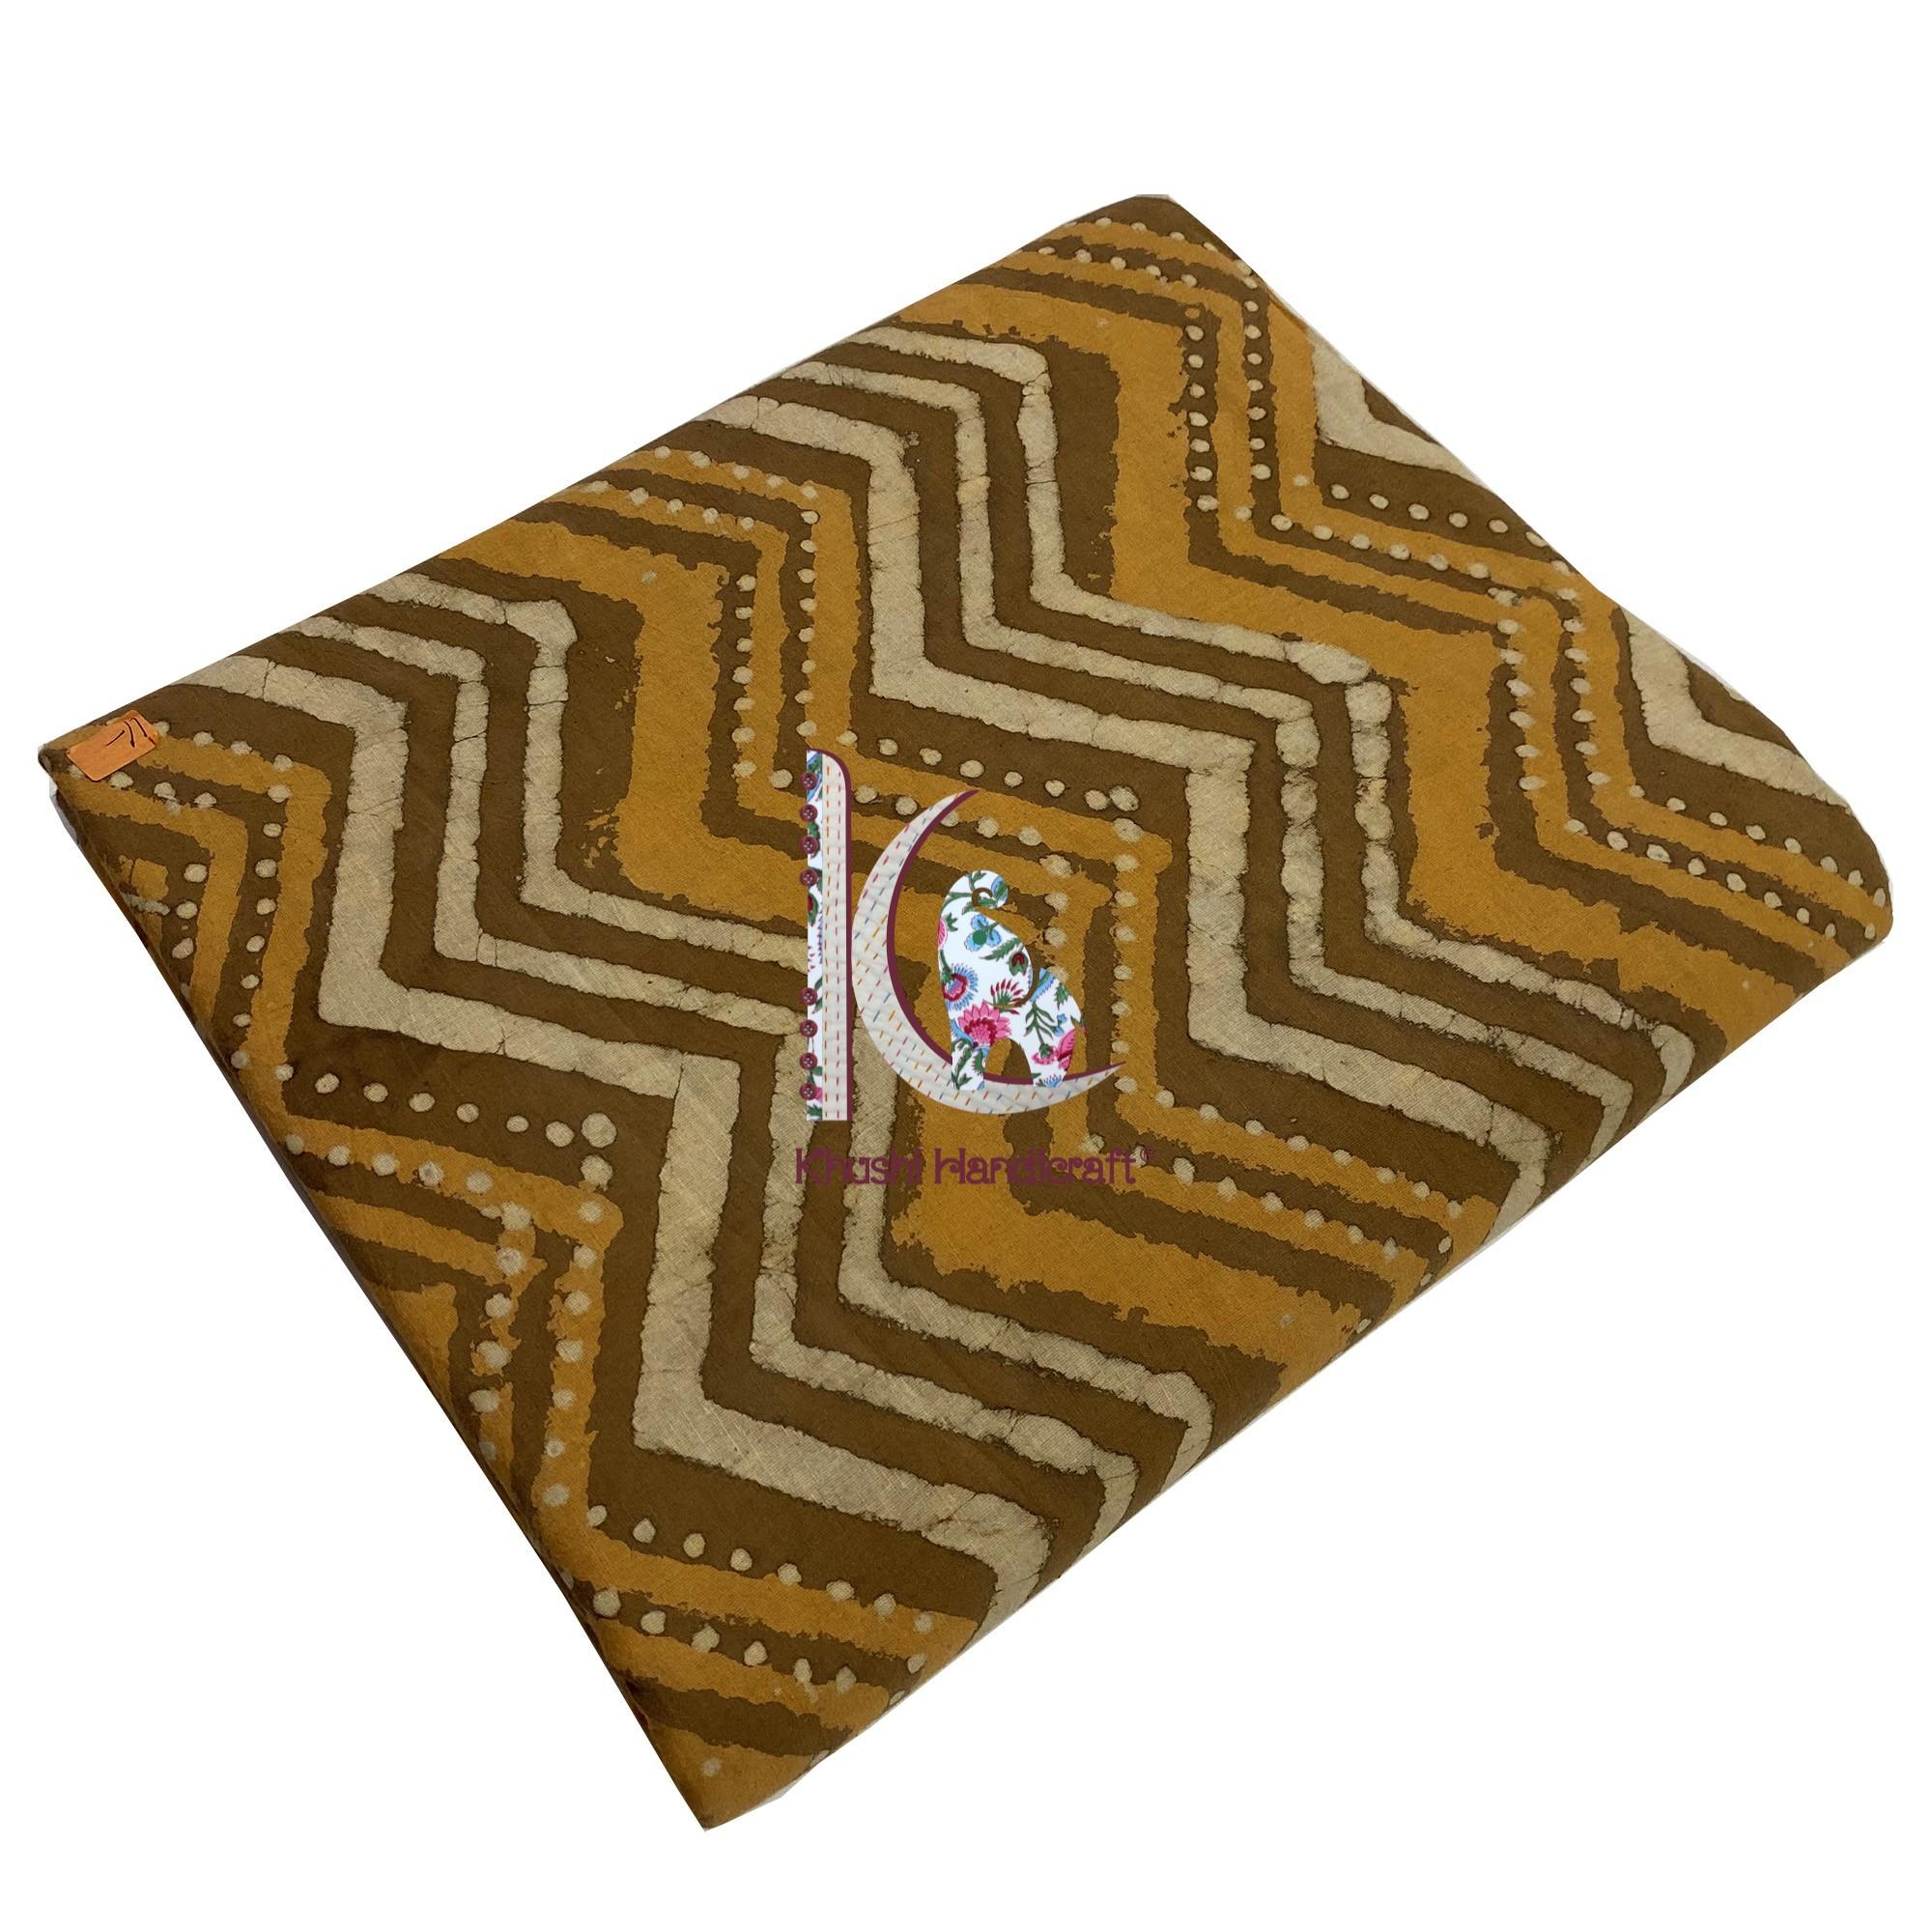 Soft Batik Fabric With Zig-zag Pattern